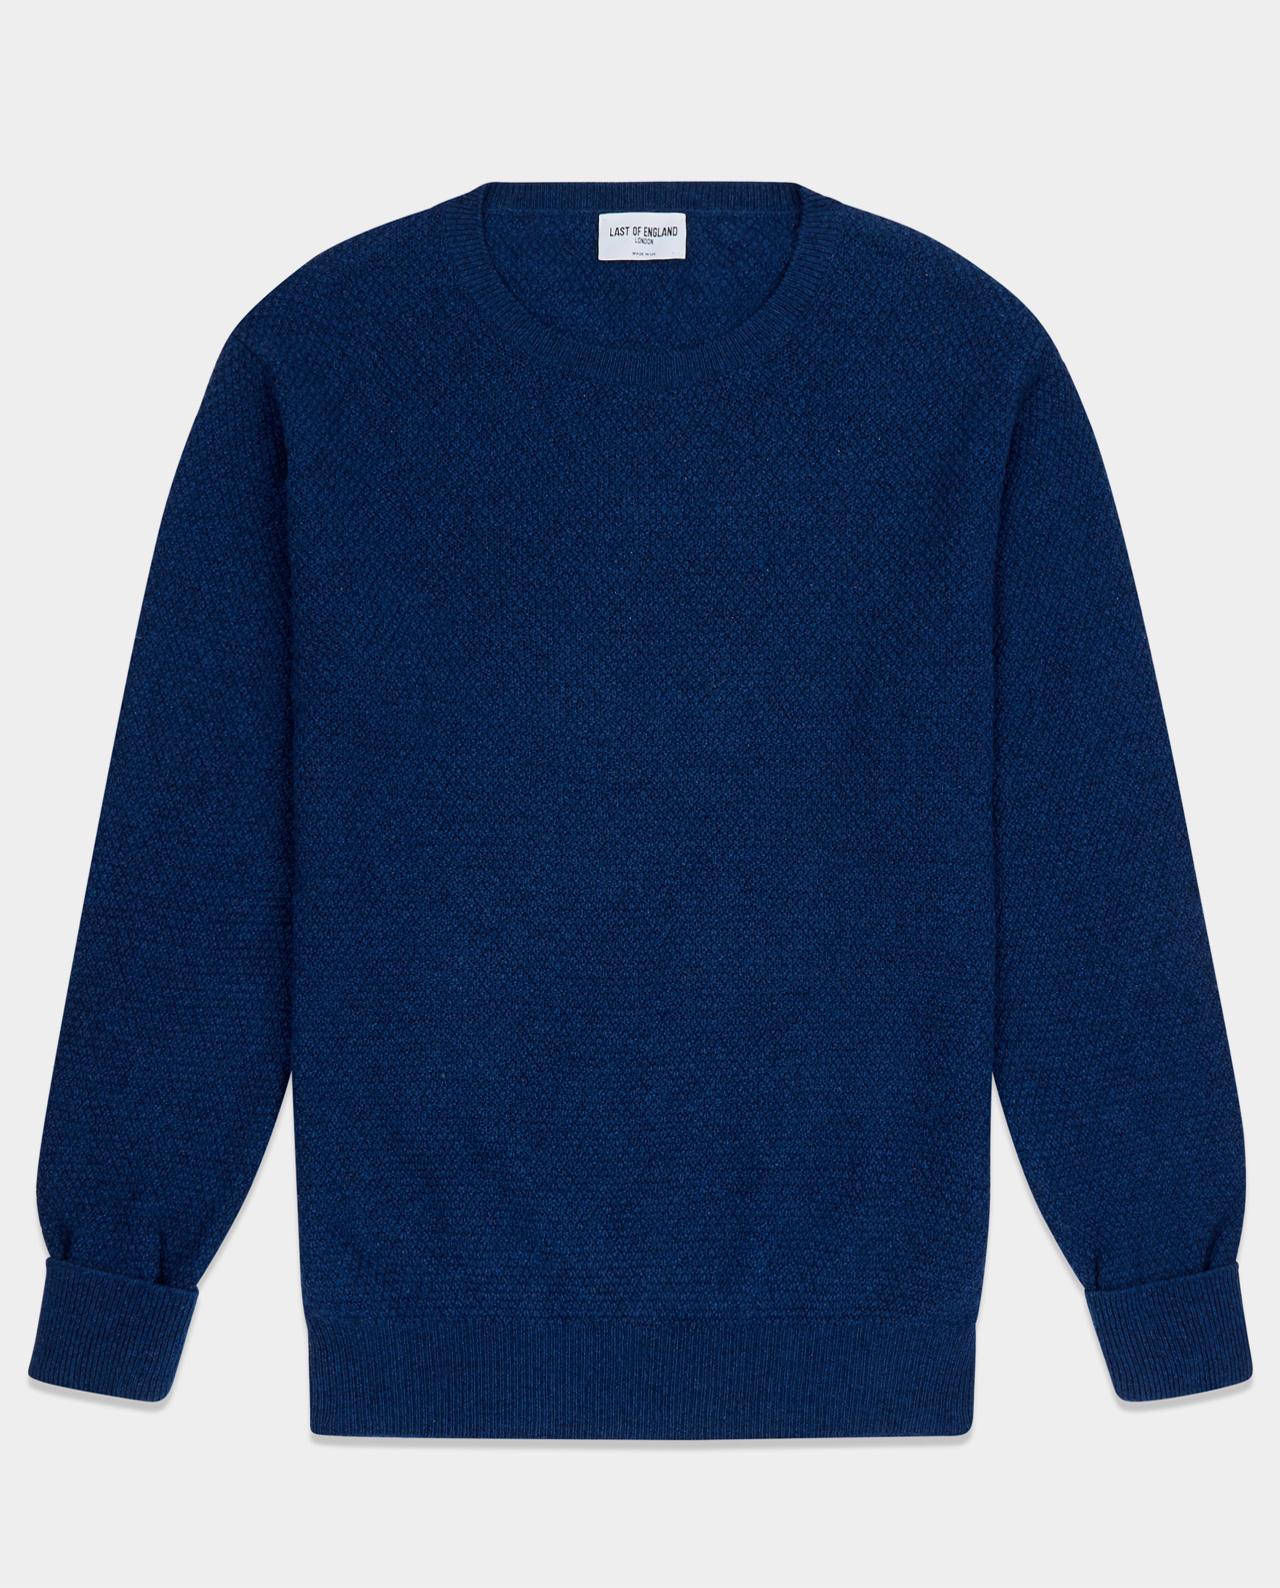 Last of England Moss Stitch Midnight Blue Jumper